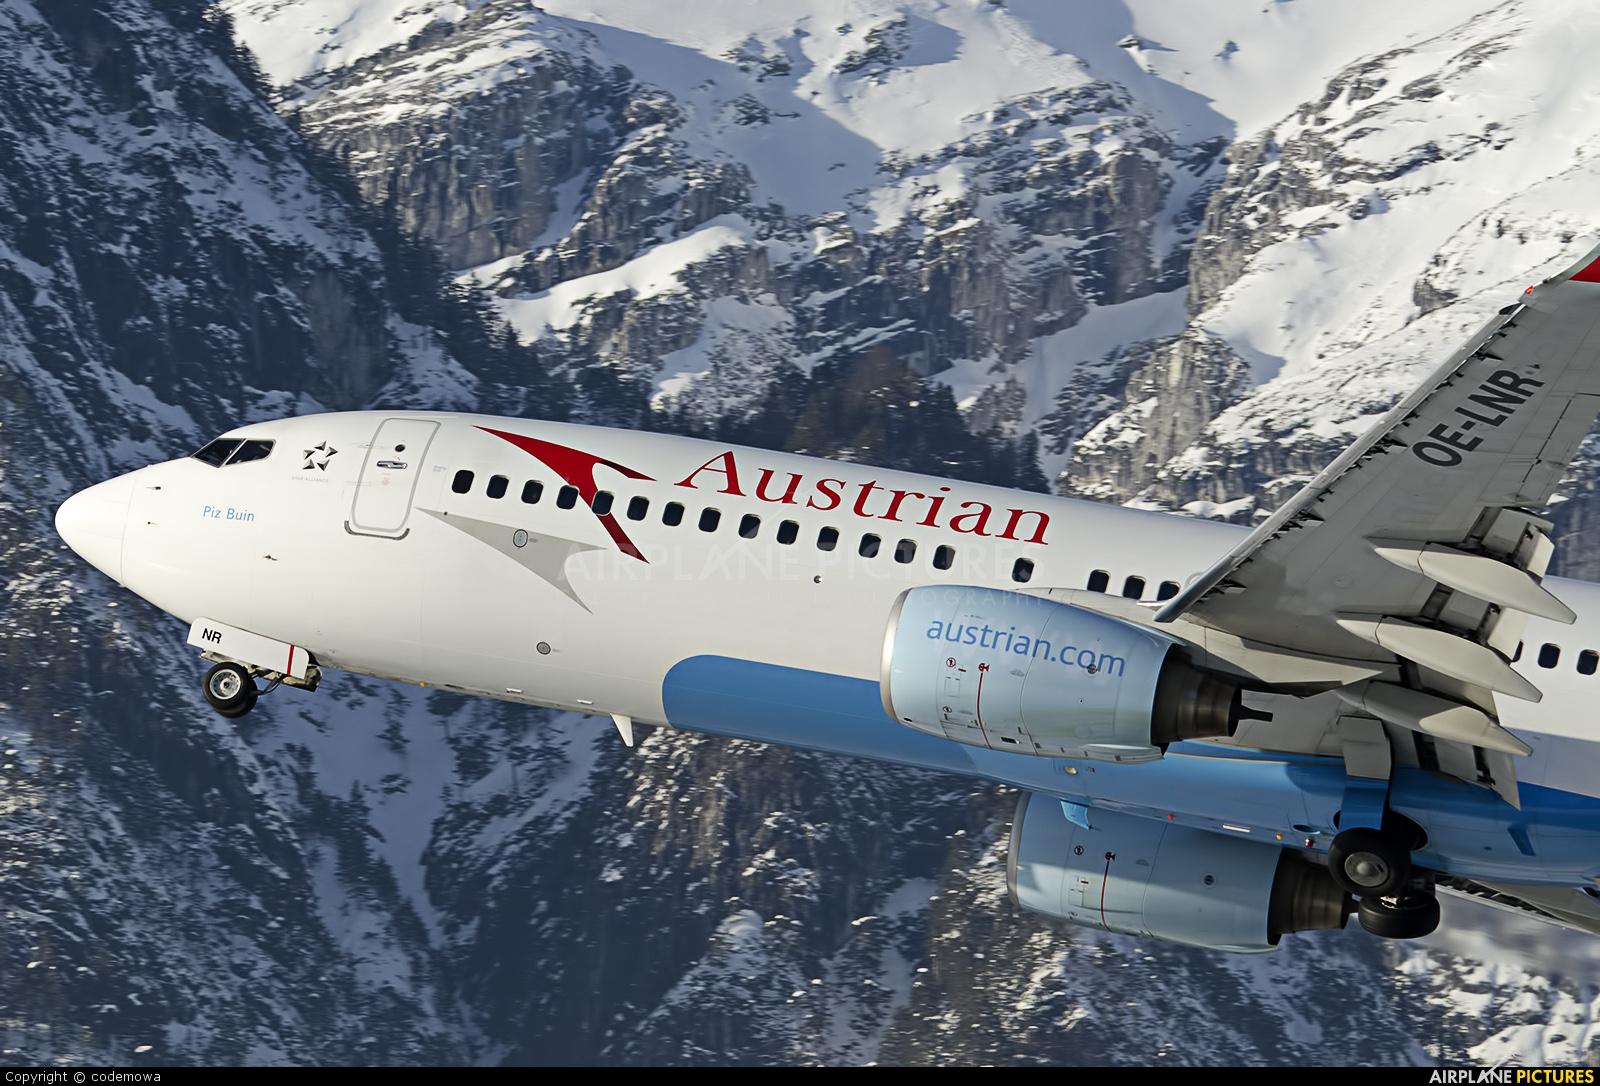 Austrian Airlines/Arrows/Tyrolean OE-LNR aircraft at Innsbruck